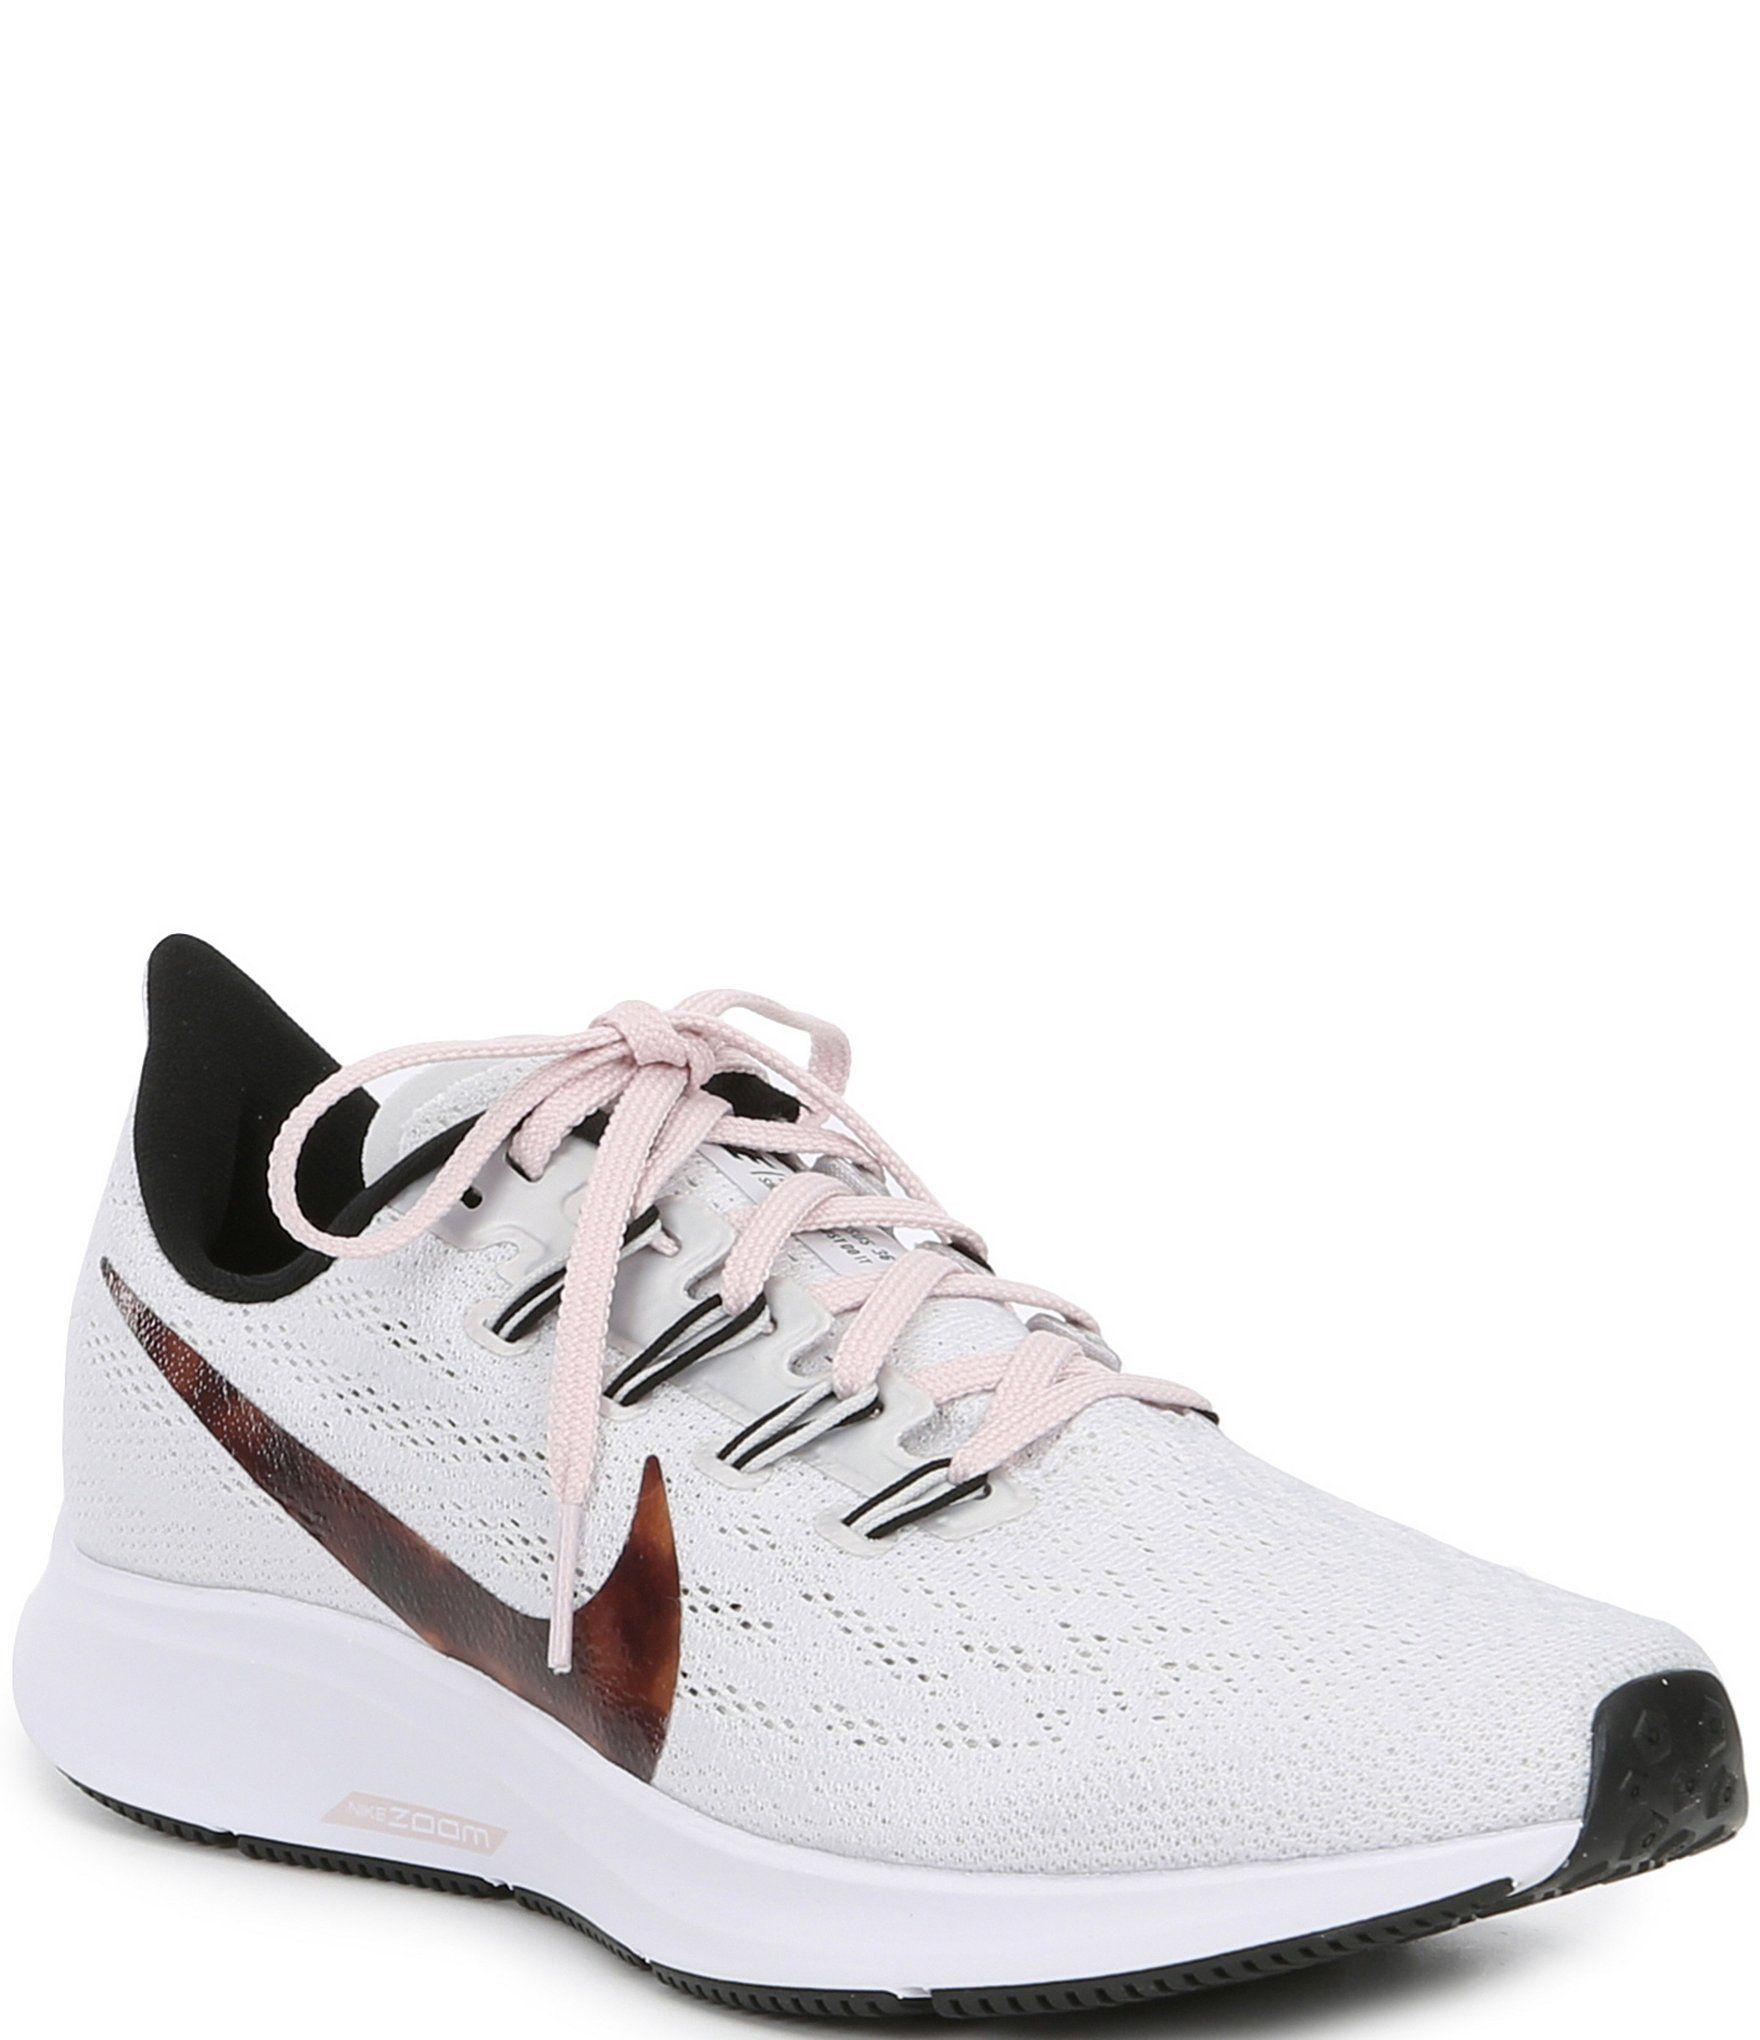 Nike Women's Air Zoom Pegasus 36 Running Shoes Vast Grey